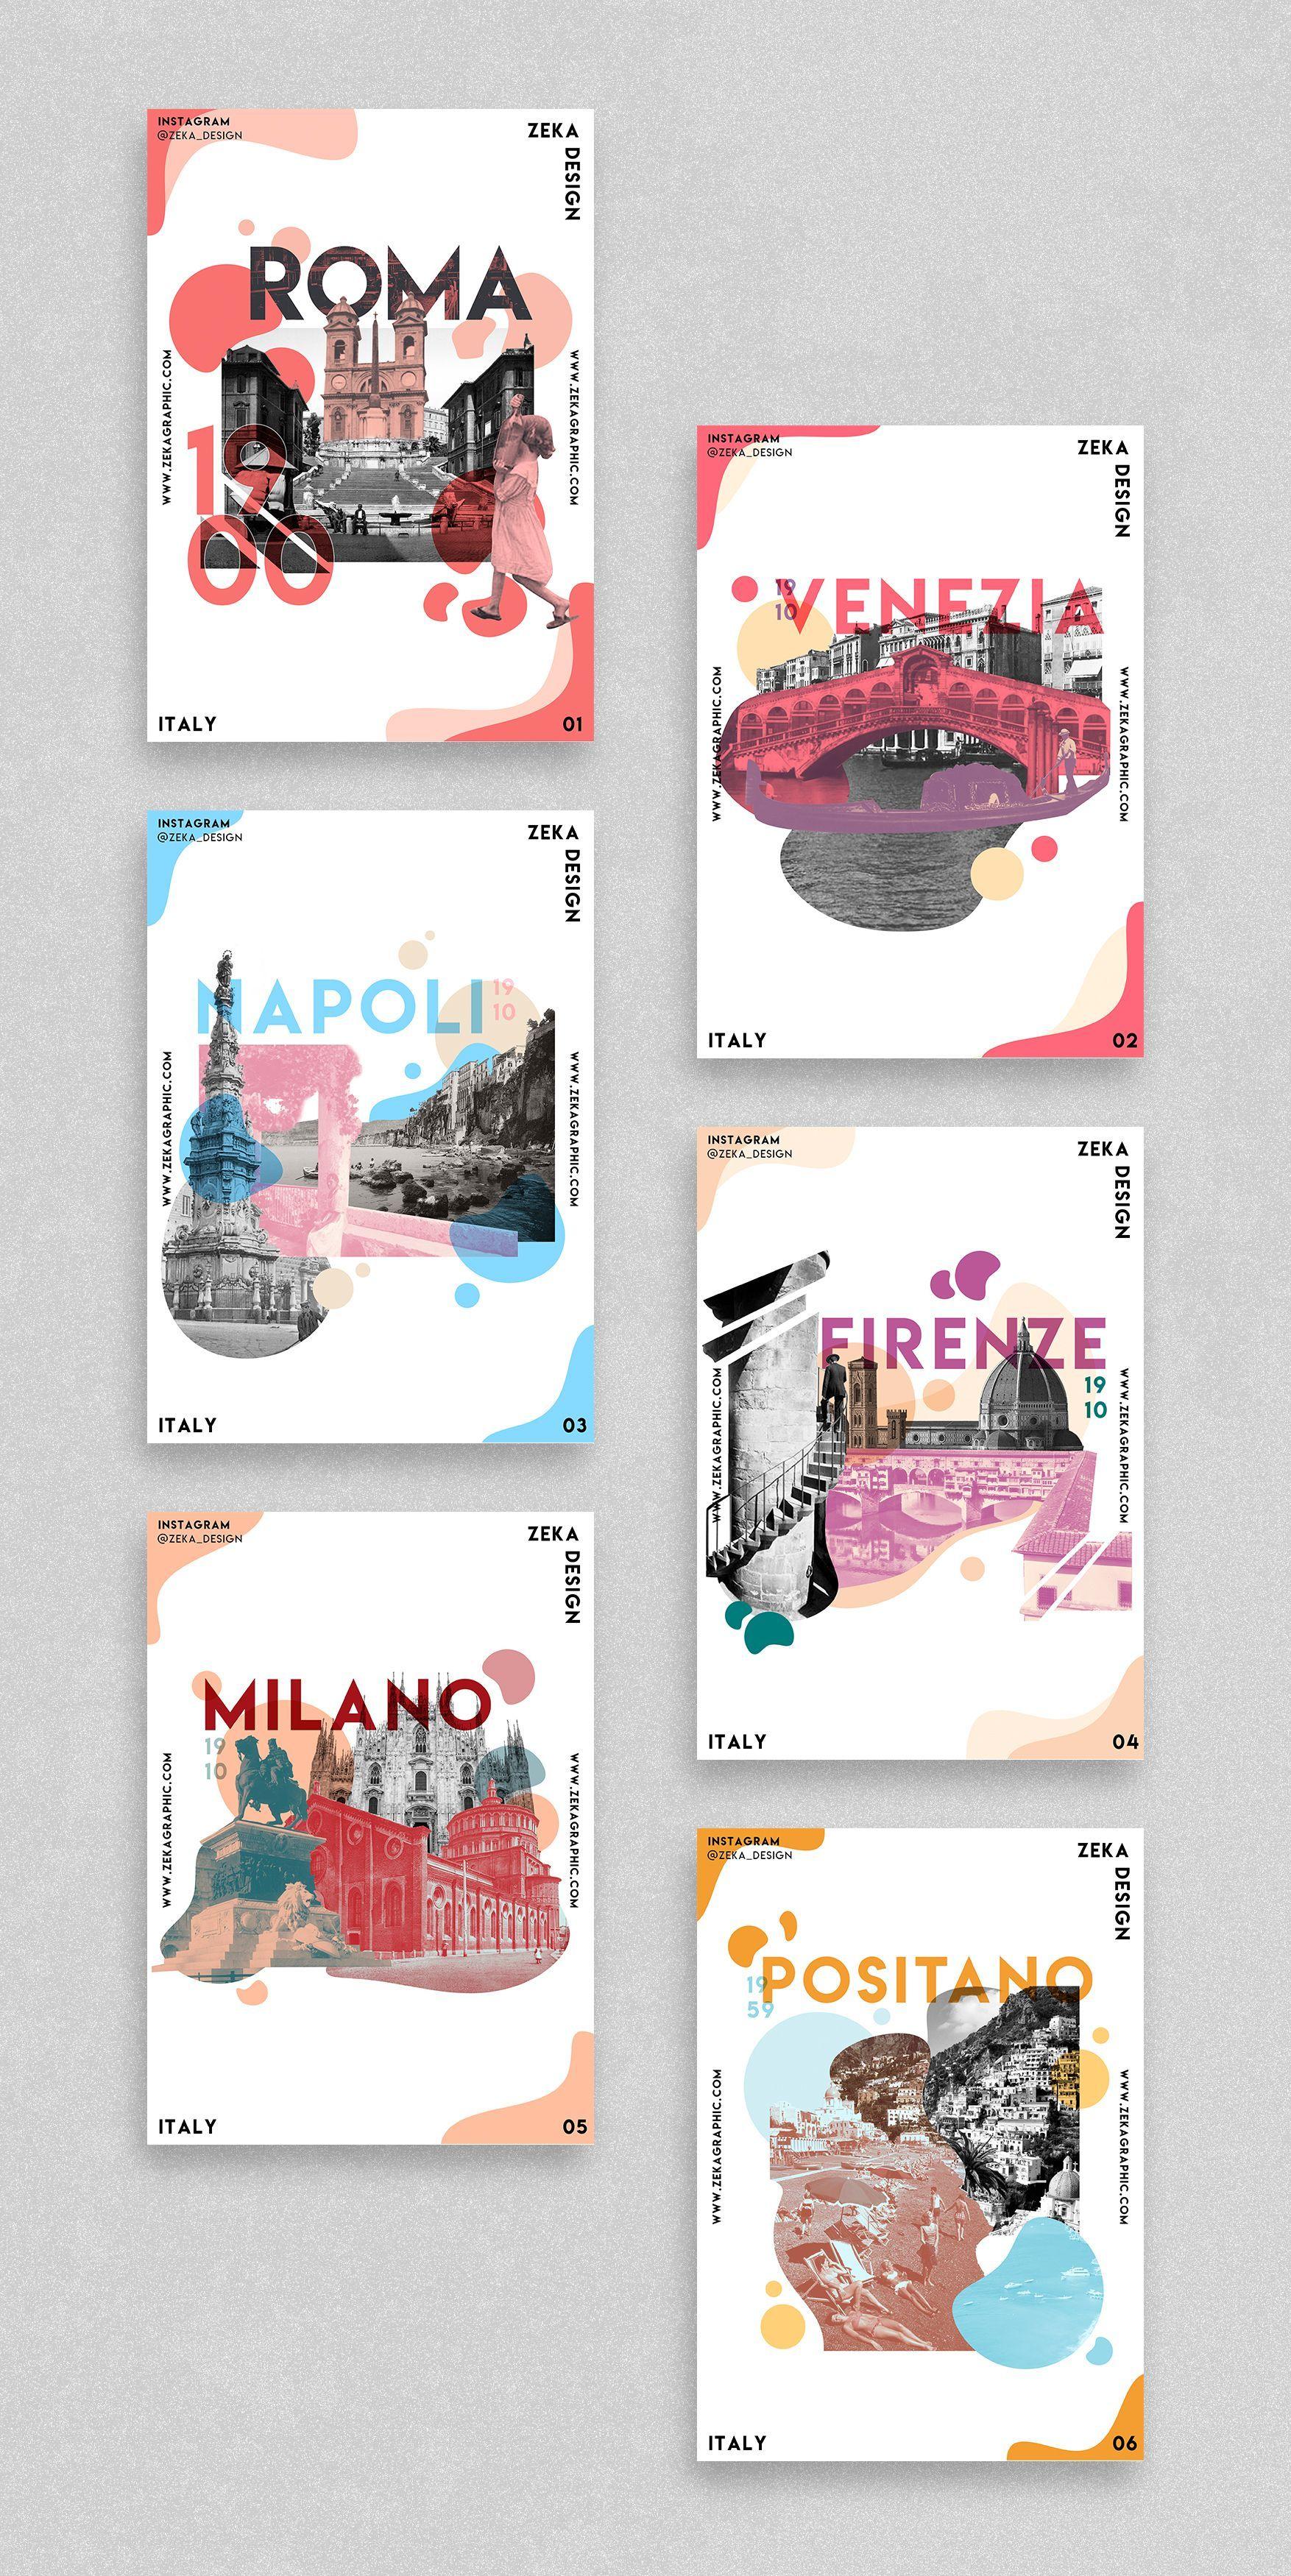 Design Layout Inspiration Flyer ; Design Layout Inspiration